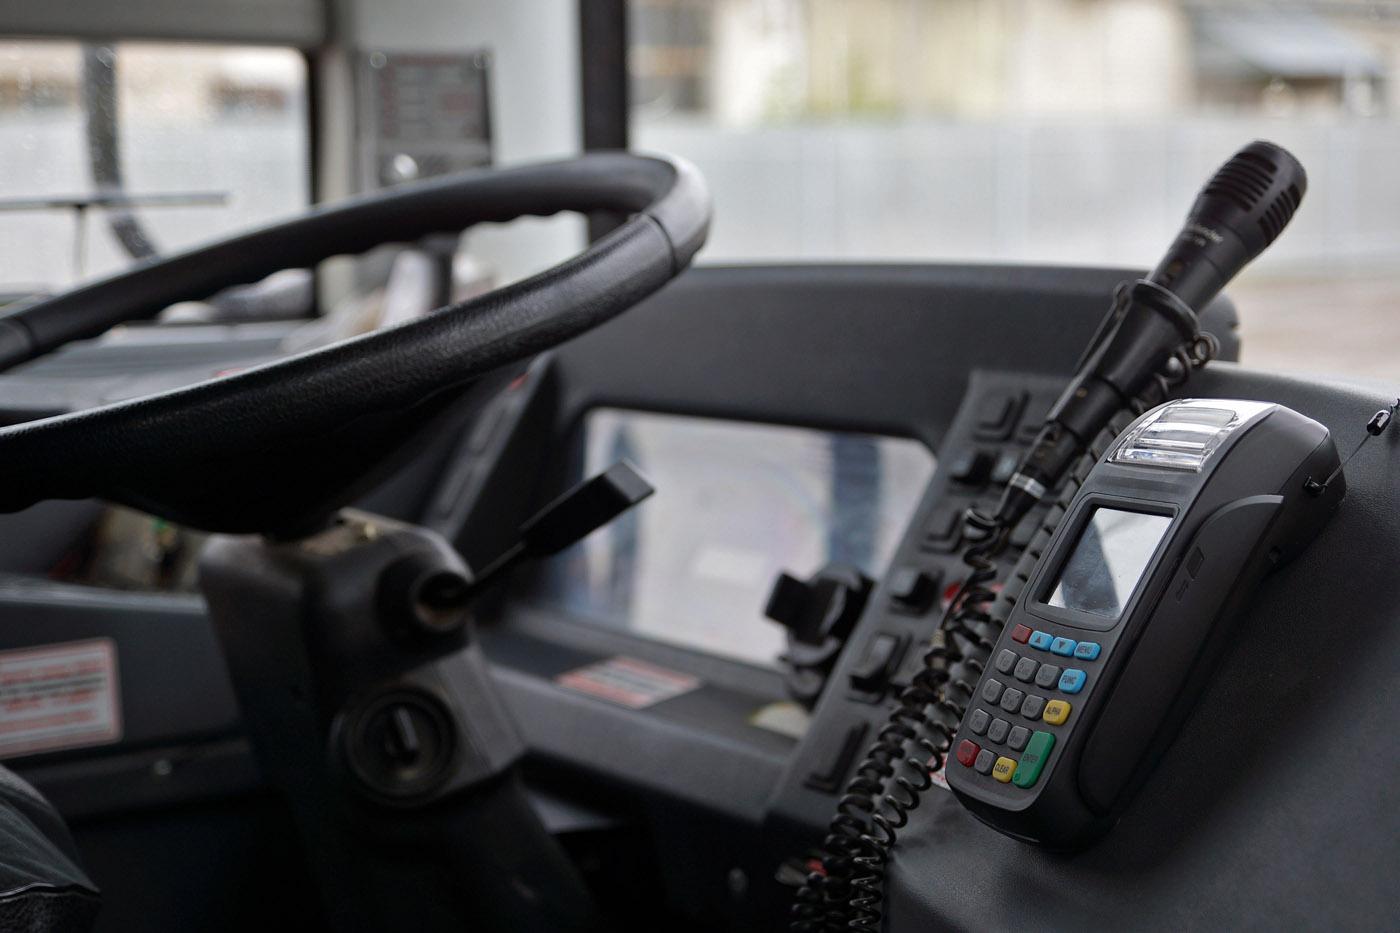 Accept non-cash payments on Kamensk-Uralsky public transport